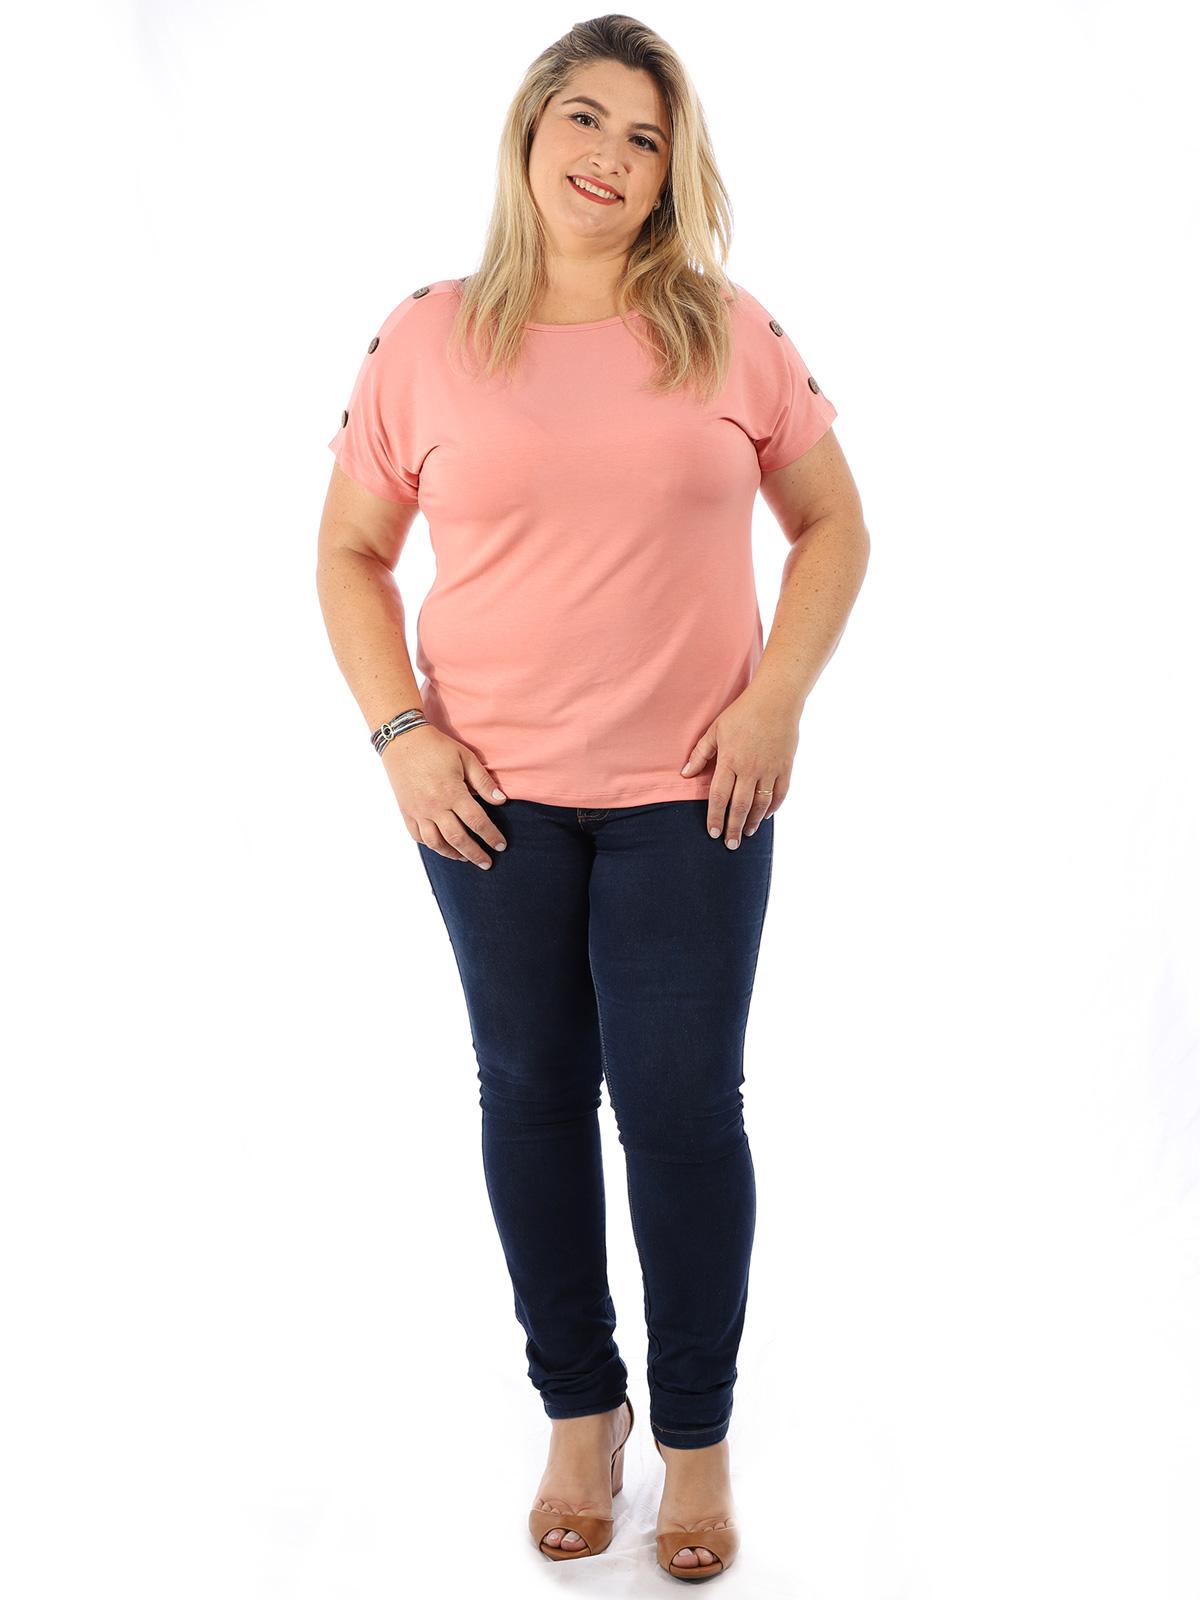 Blusa Plus Size Feminina Decote Canoa Botões Ombro Rosê